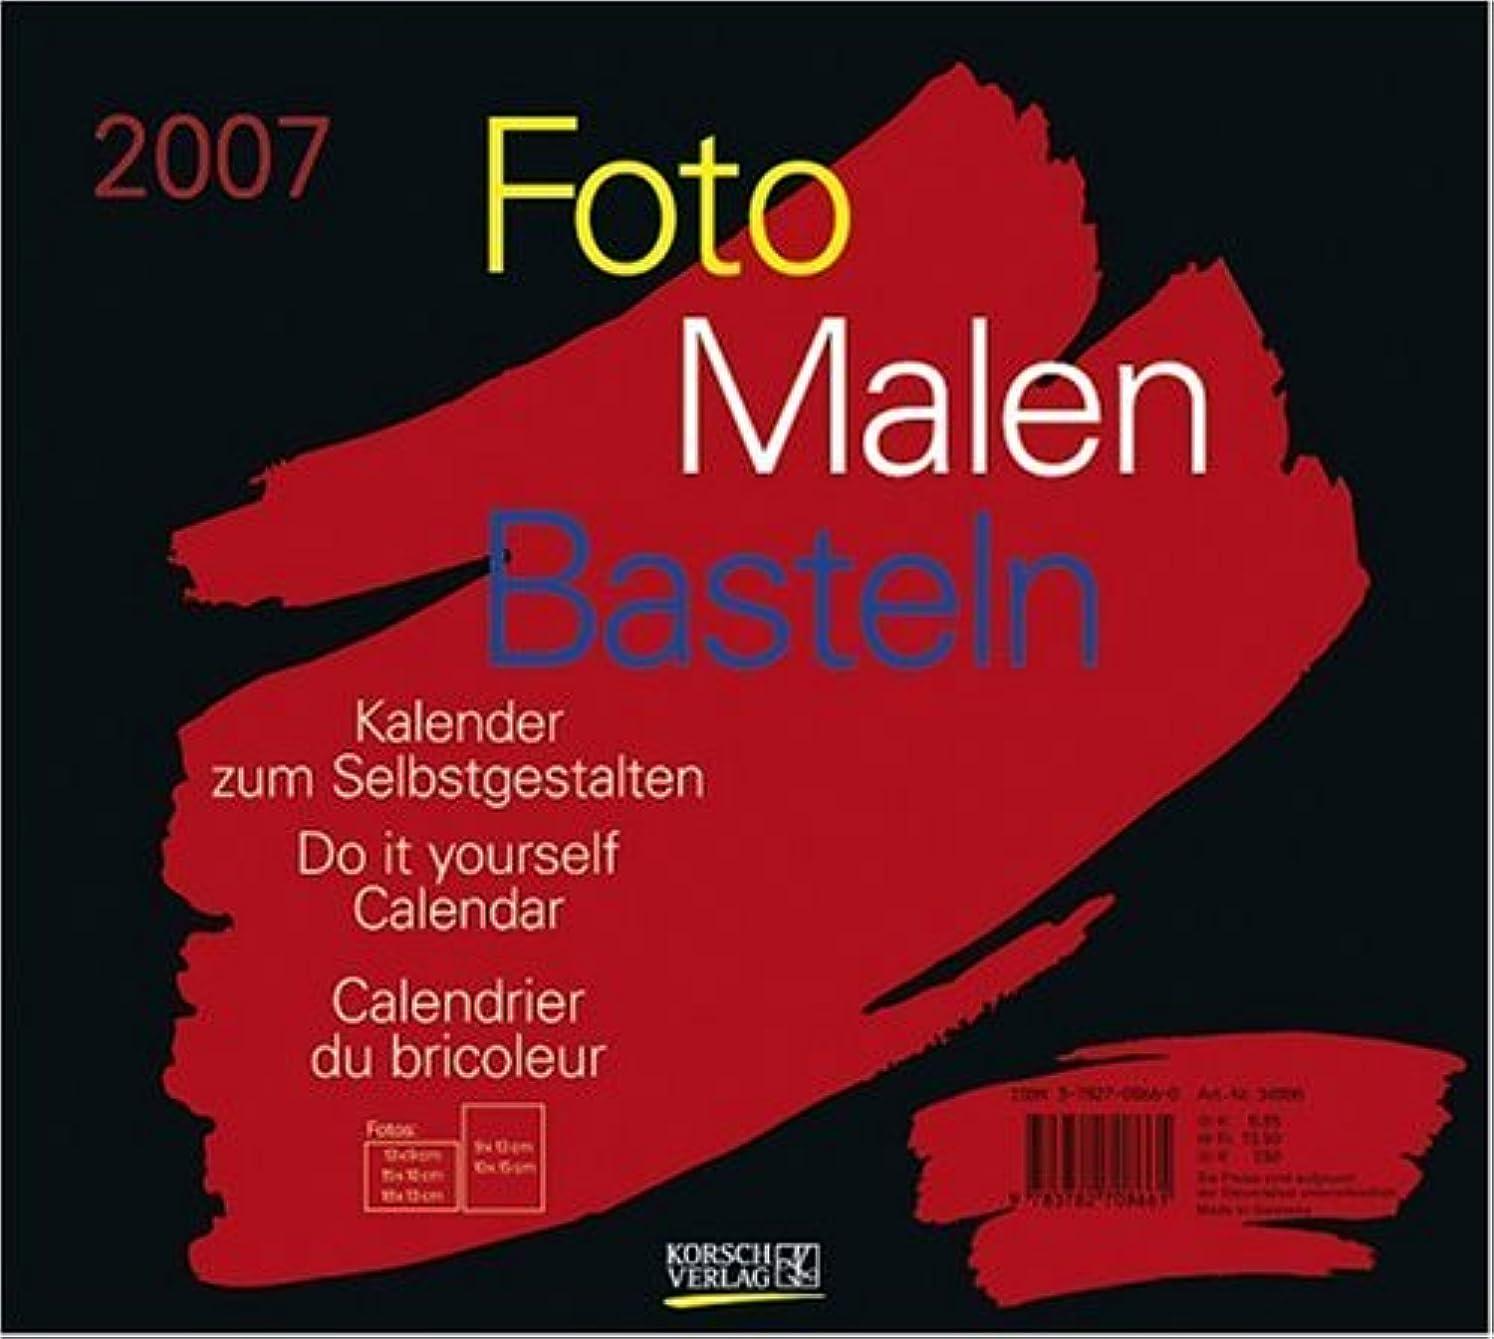 失態刈り取る虚偽Foto, Malen, Basteln schwarz (quer) 2007. Kalender zum Selbstgestalten.